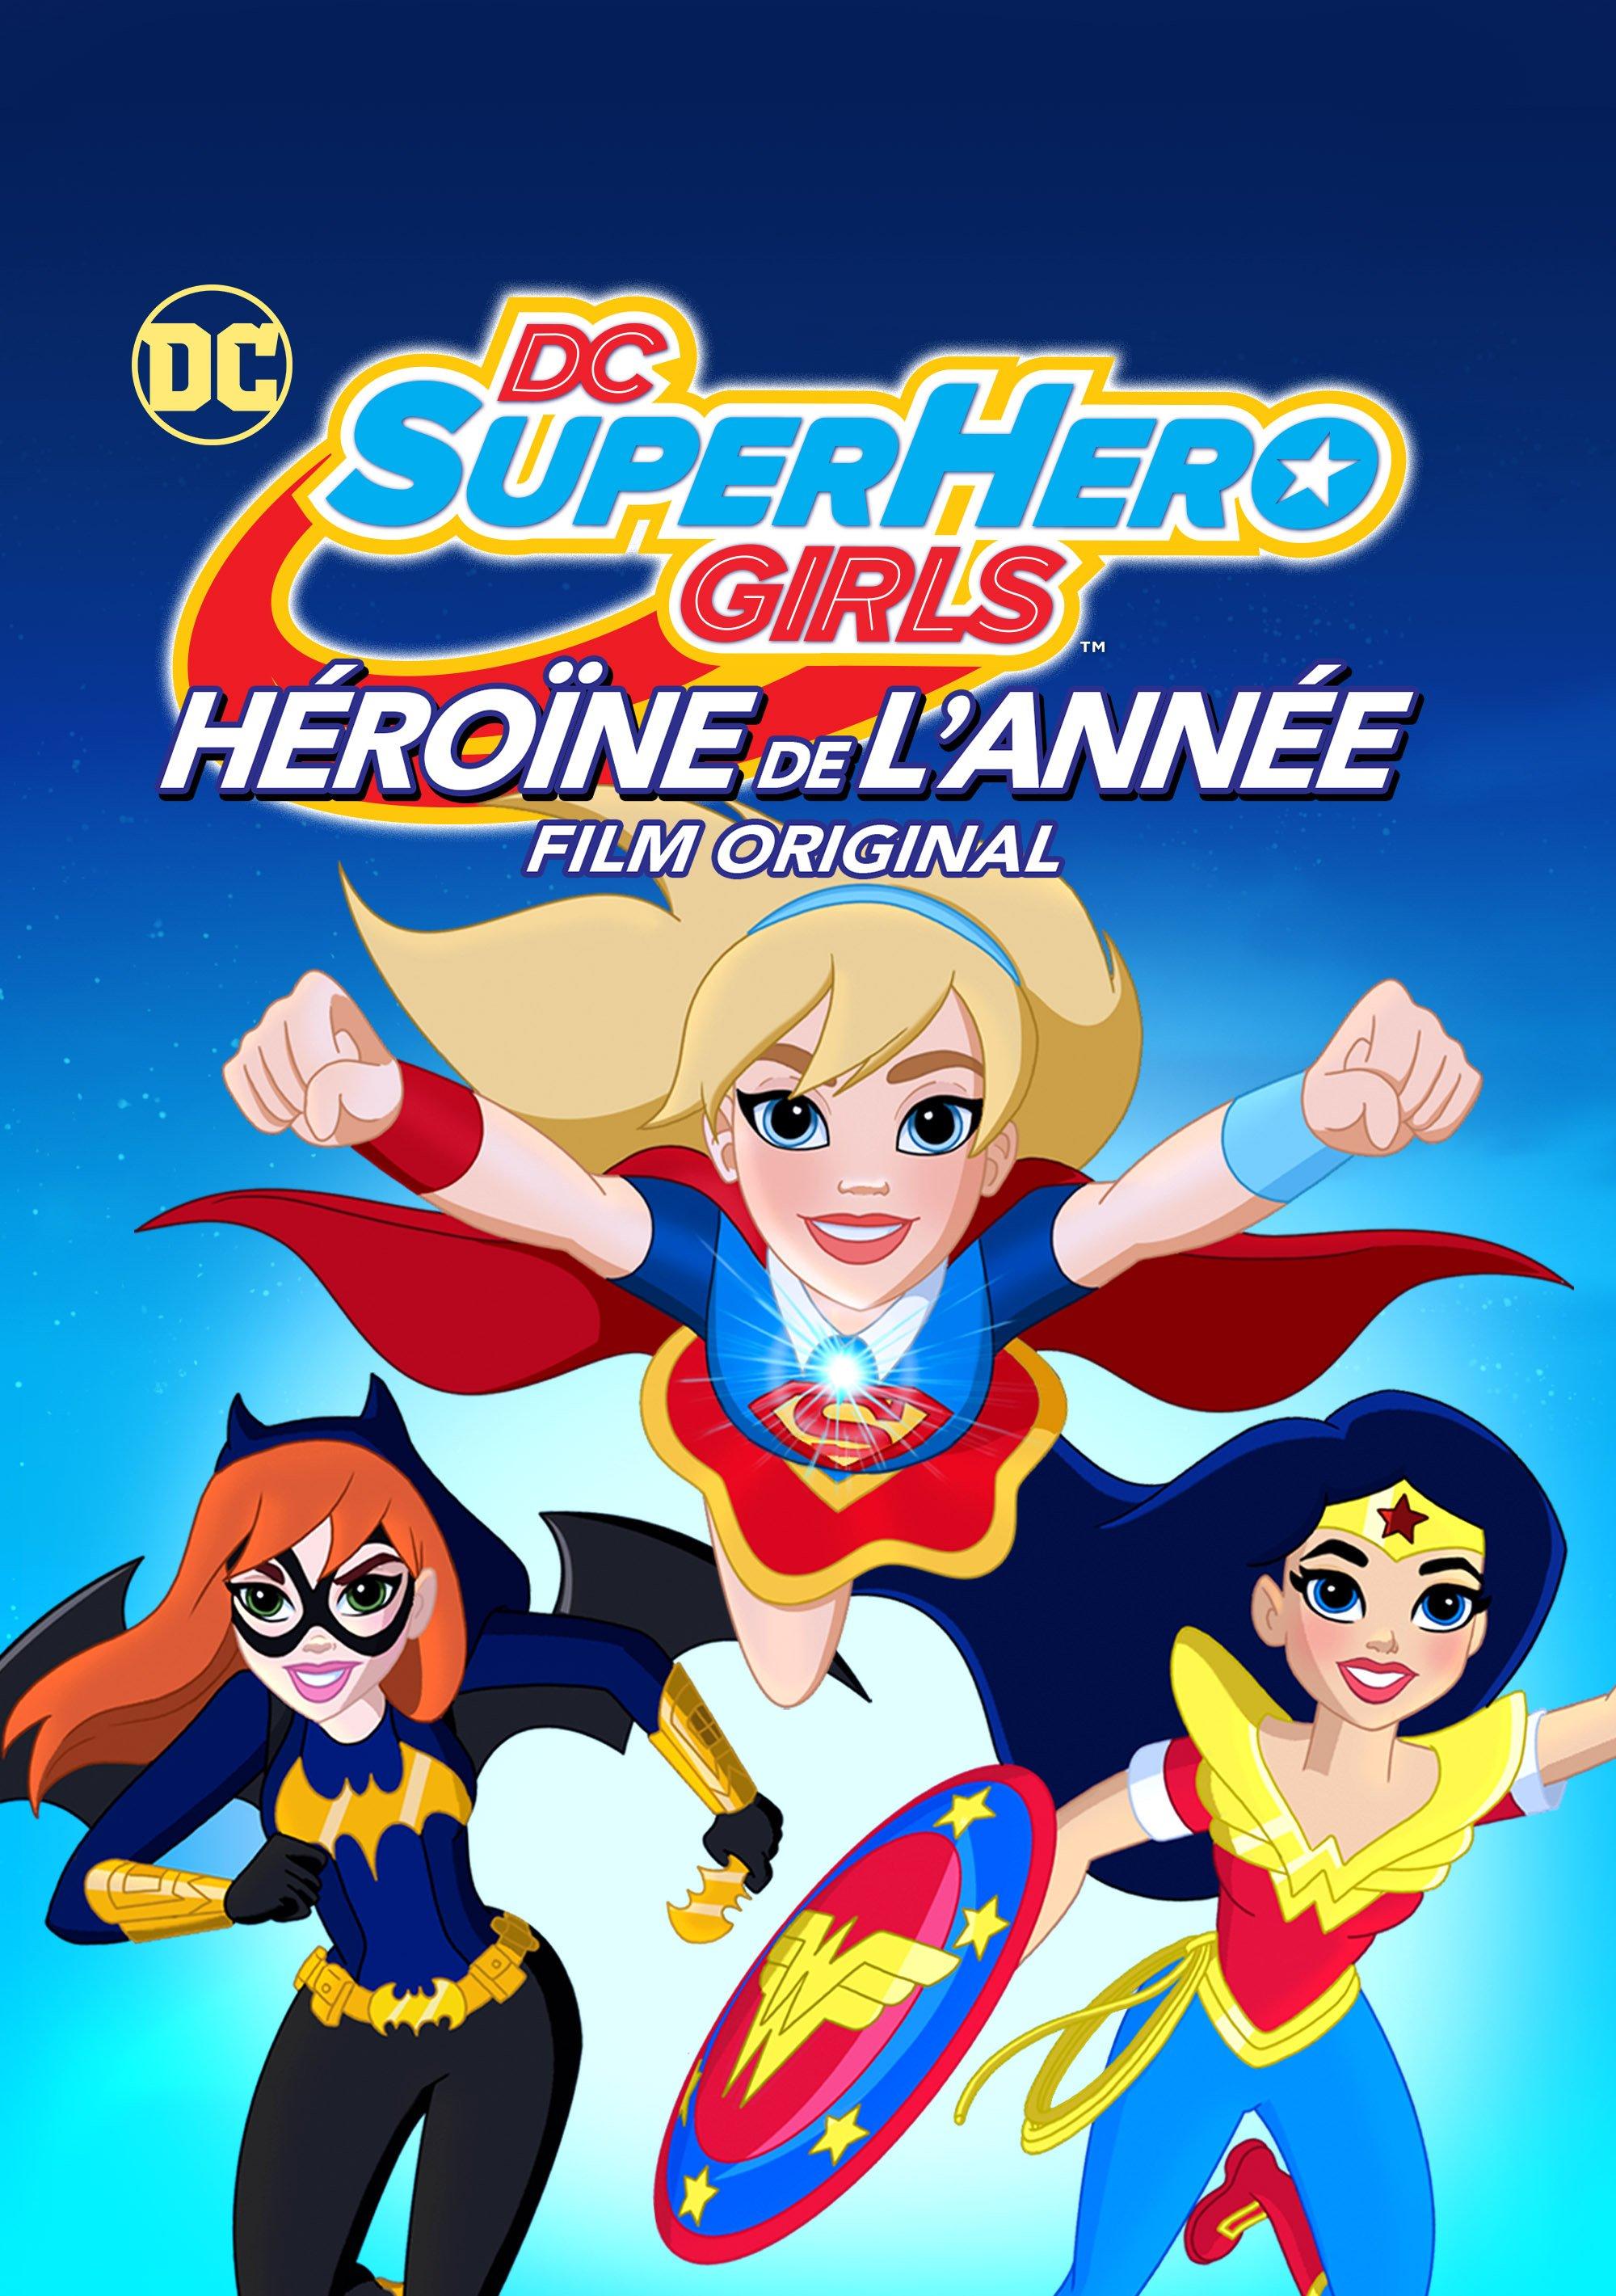 affiche du film DC Super Hero Girls : Héroïne de l'année